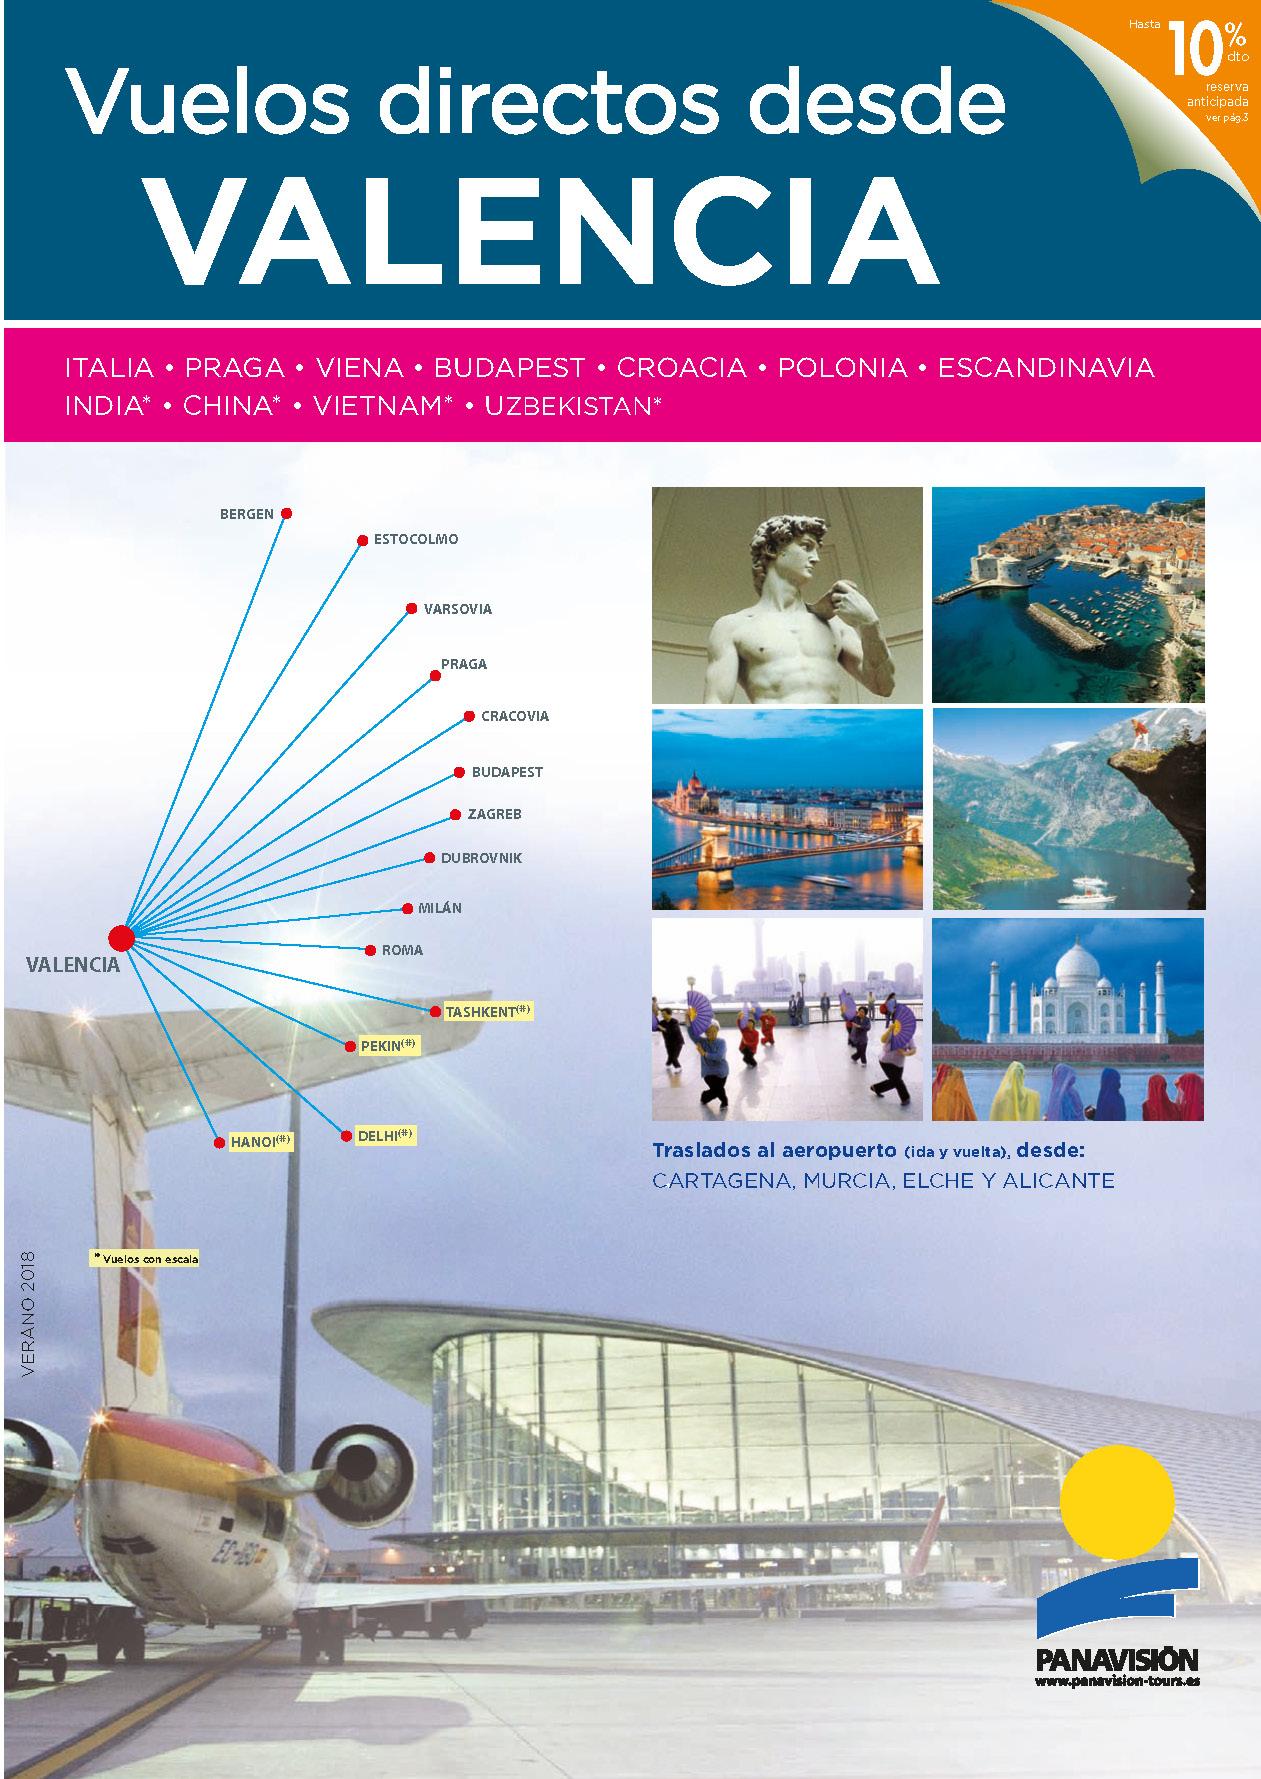 Catalogo Panavisión Circuitos con vuelos directos desde Valencia 2018 VL8